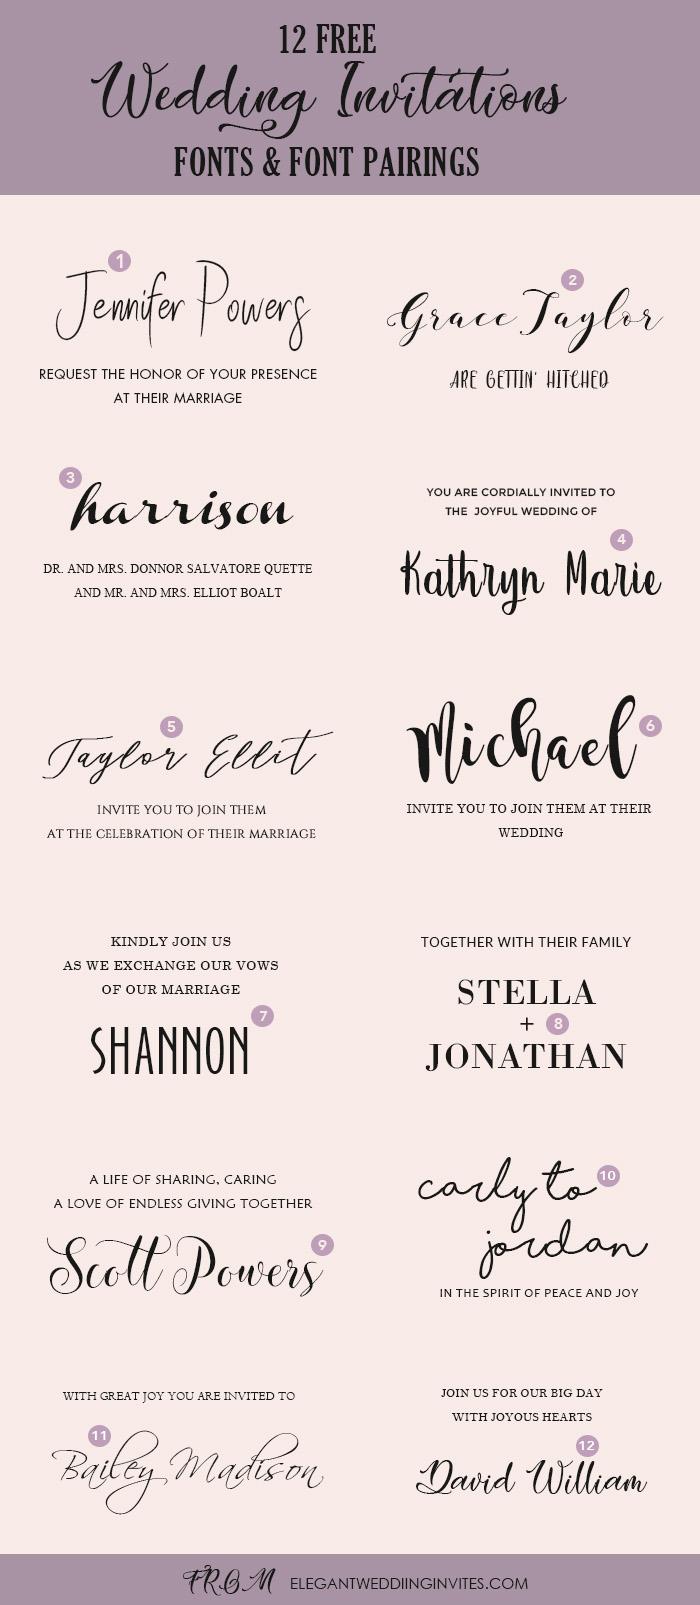 wedding invitation font pairing